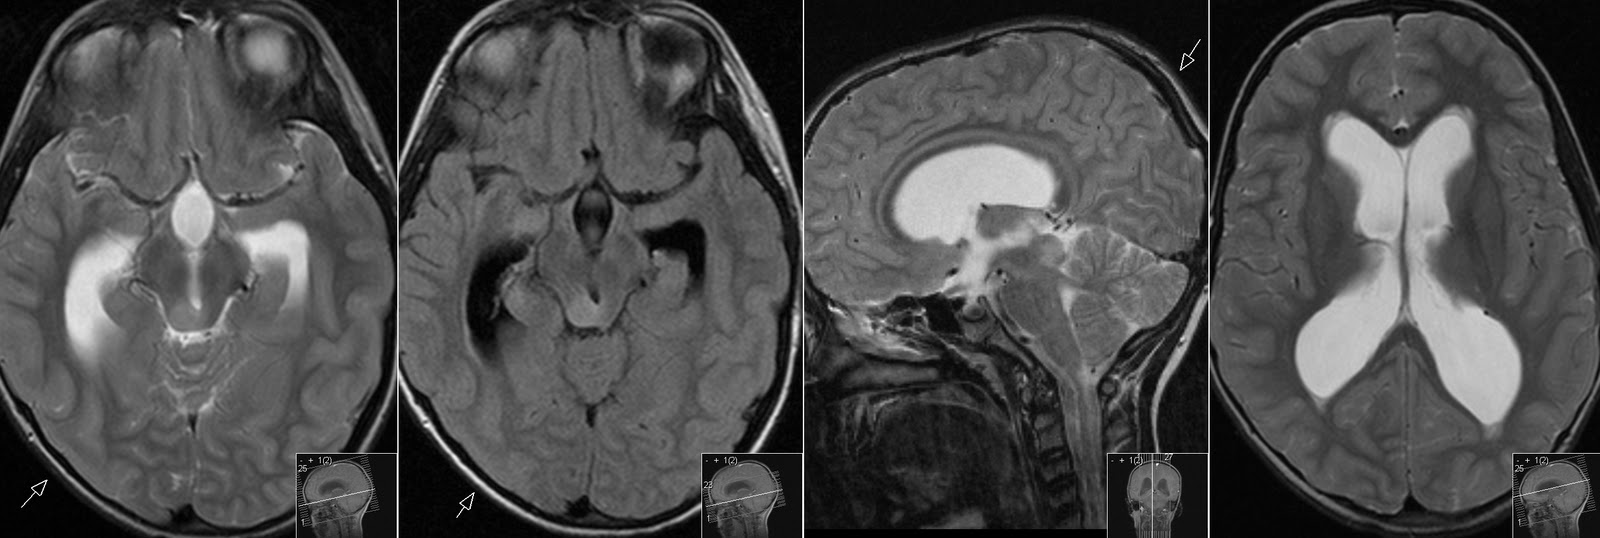 Radiology MRI: Tectal Glioma